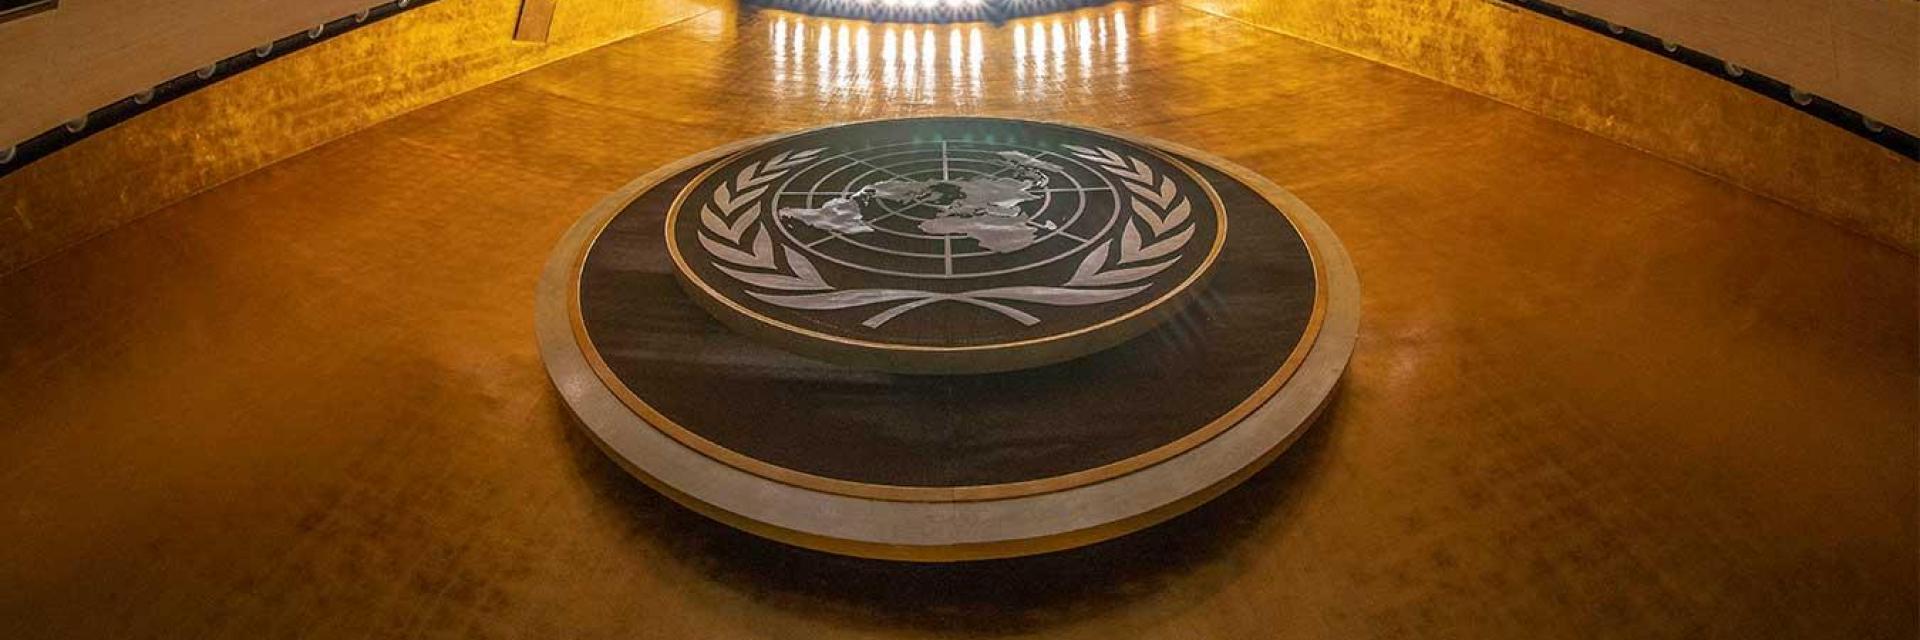 Secretary-General's message (2021)